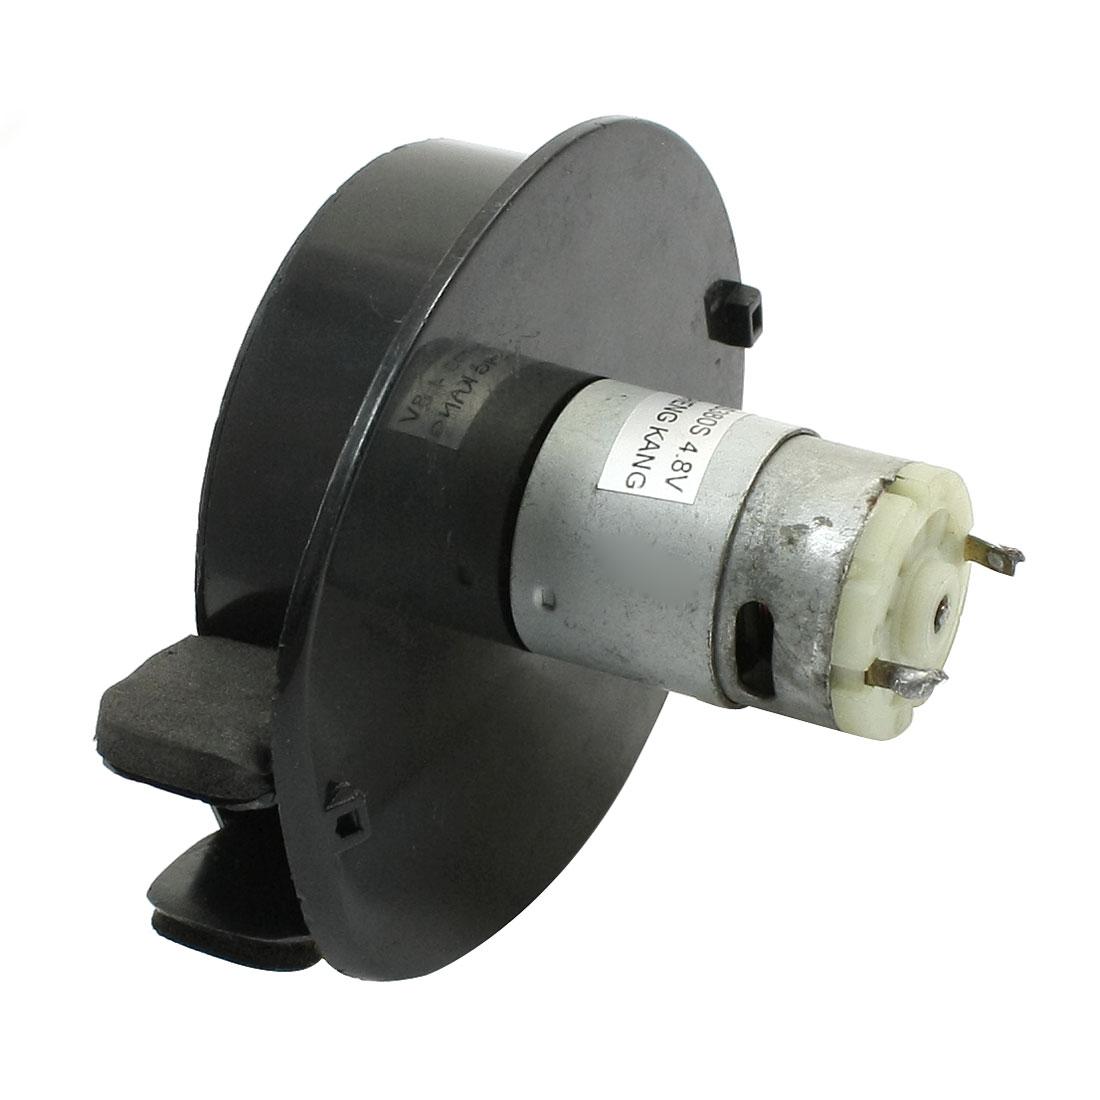 Vacuum Cleaner Magnetic DC Micro Motor 4.8V w Black Plastic Air Blower